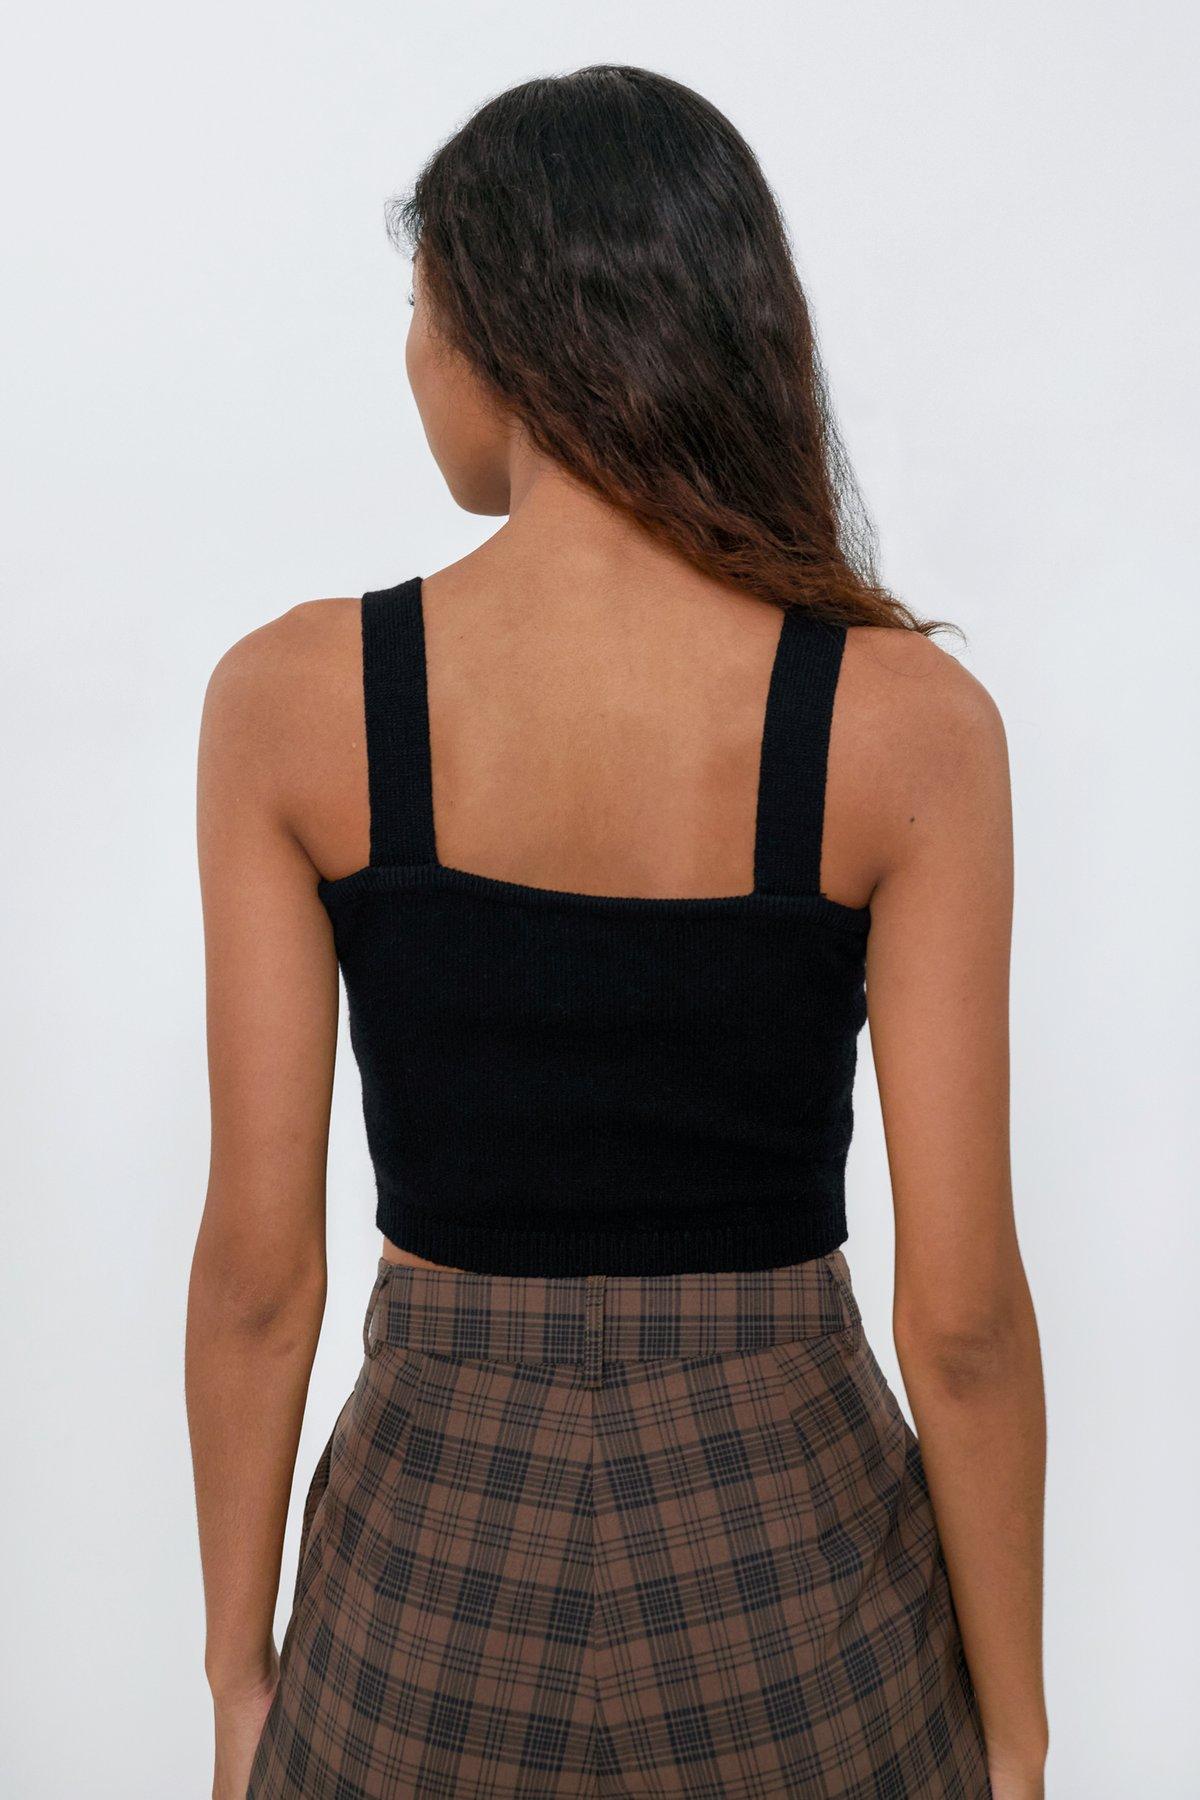 Arley Knit Bralet (Black)